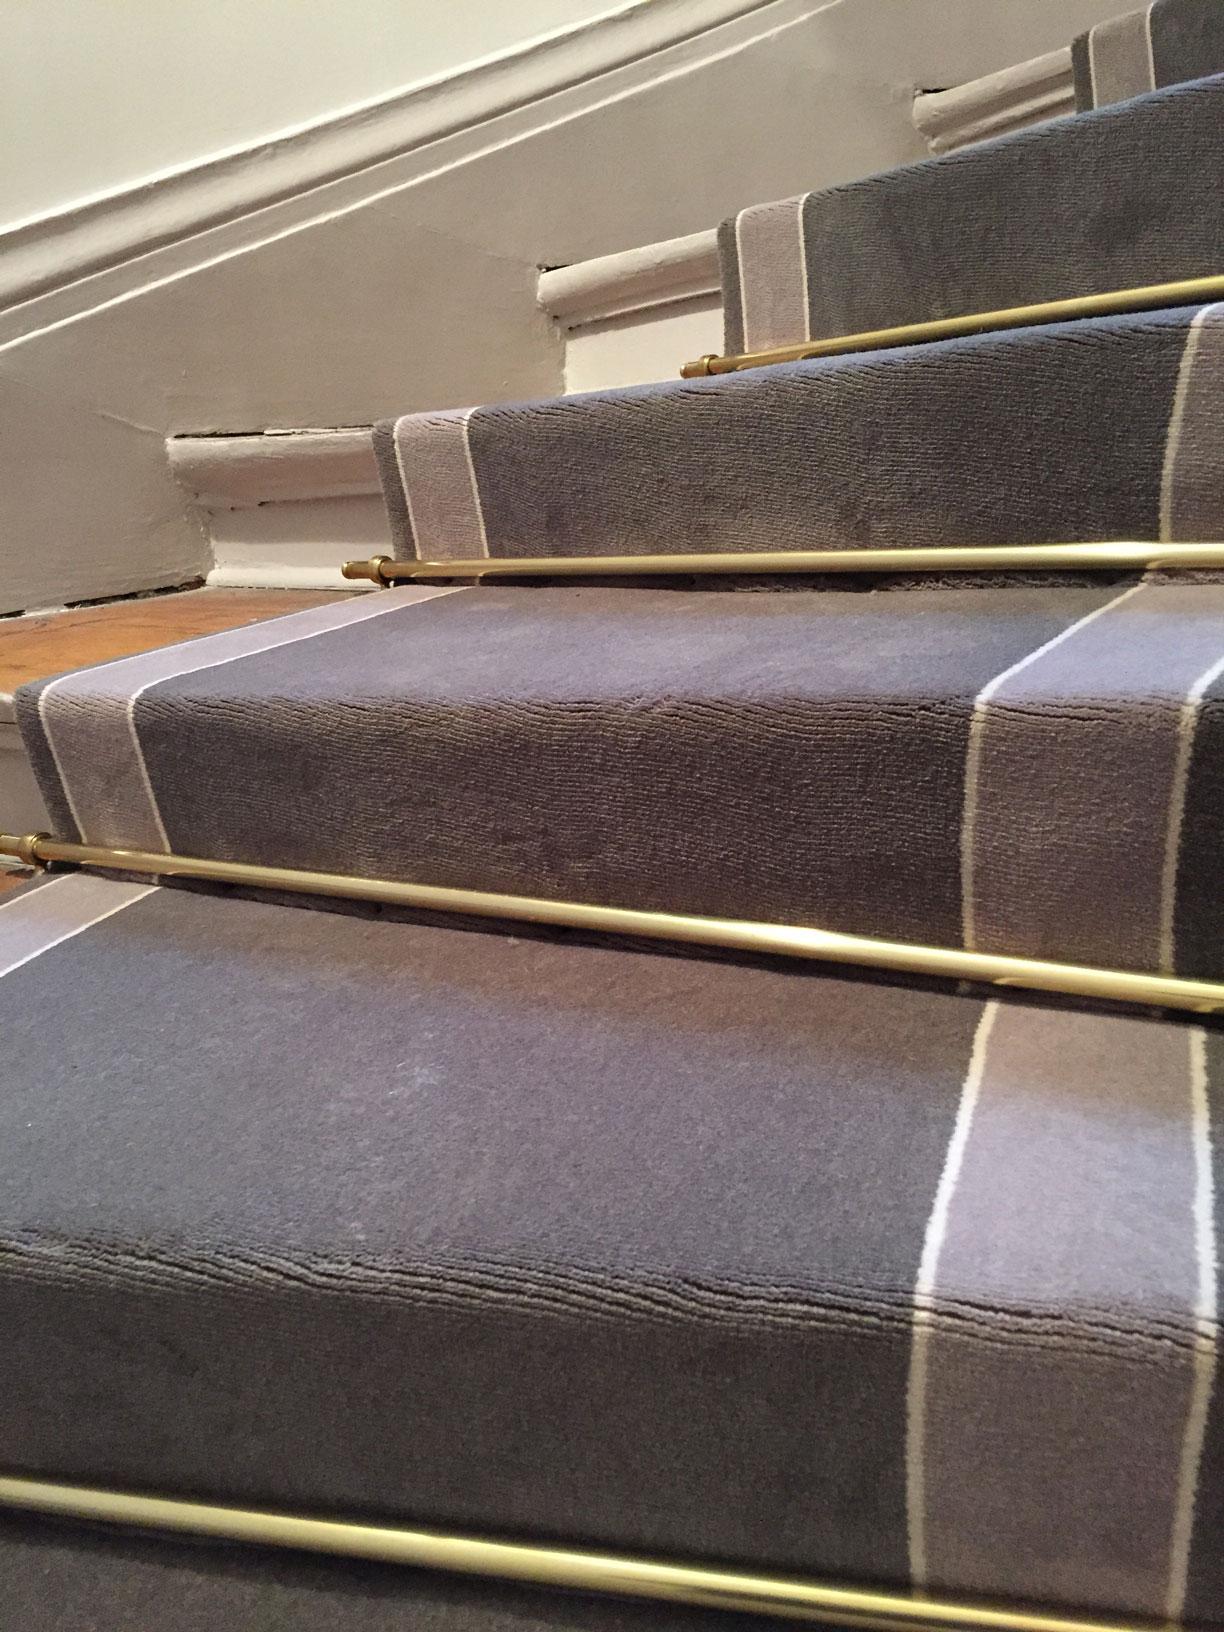 Carrelage design tapis marche escalier moderne design for Marche du carrelage